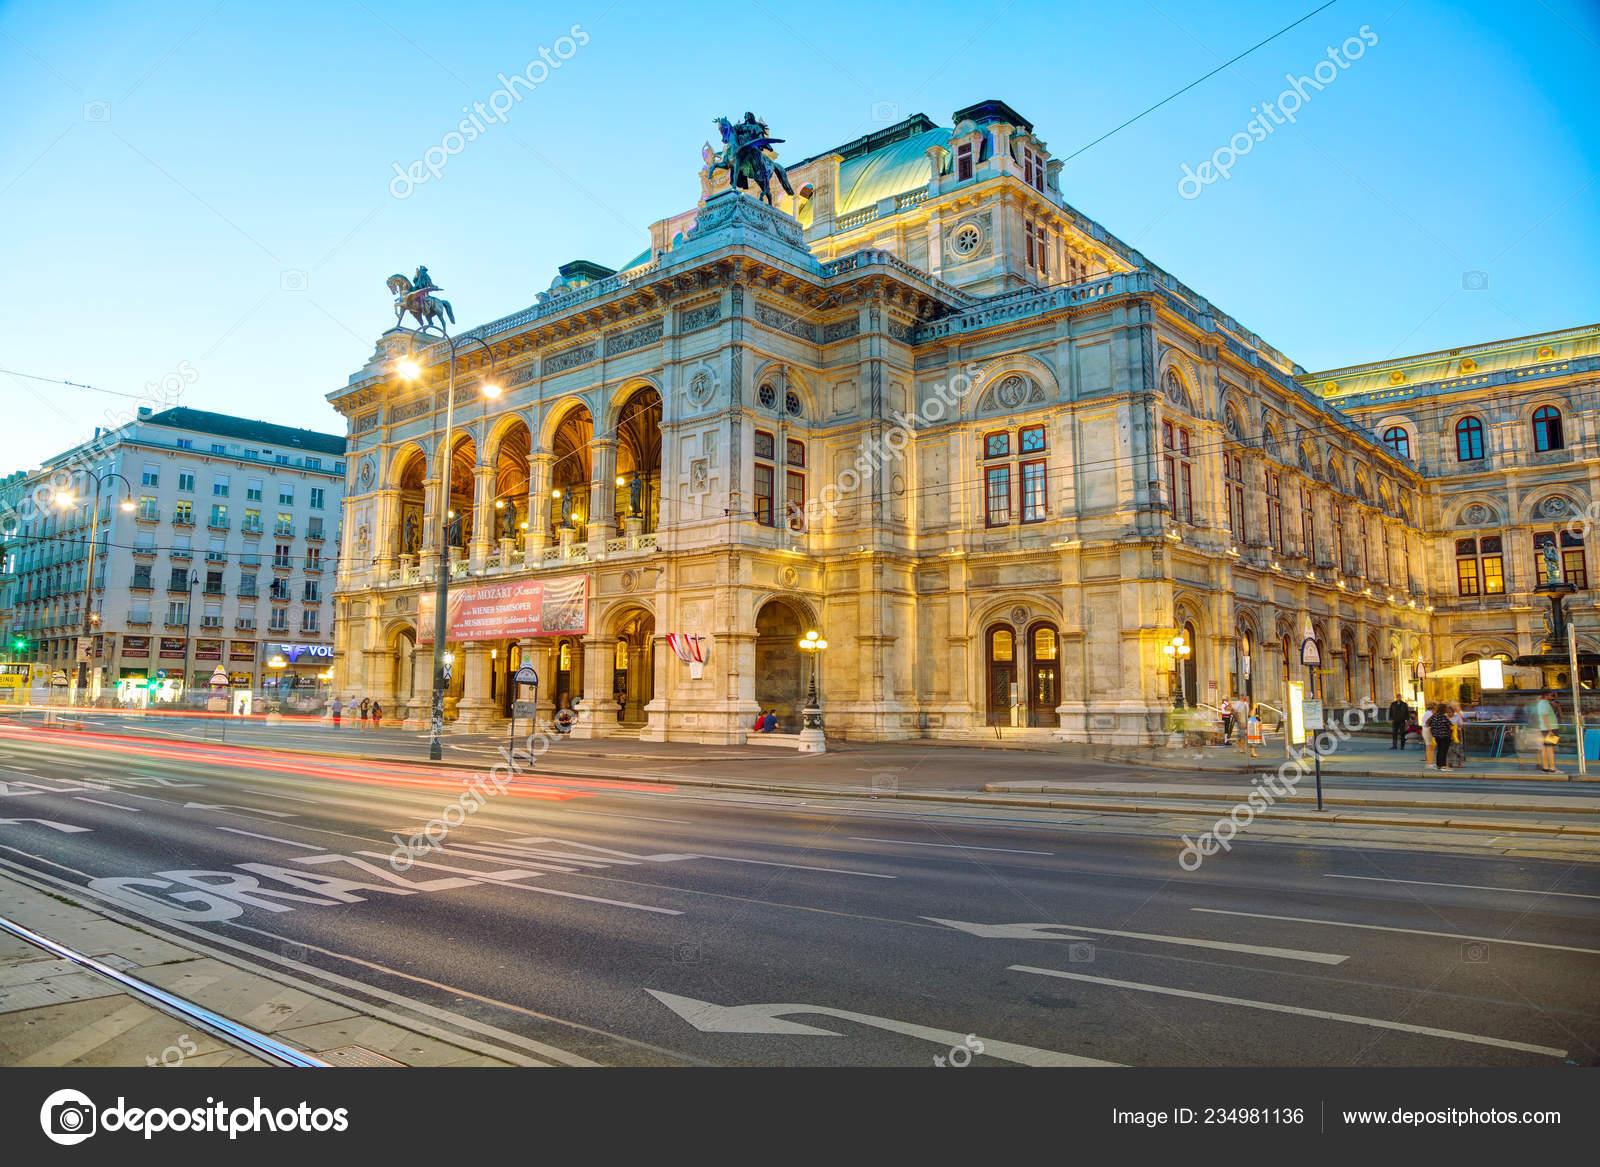 Opera House dating